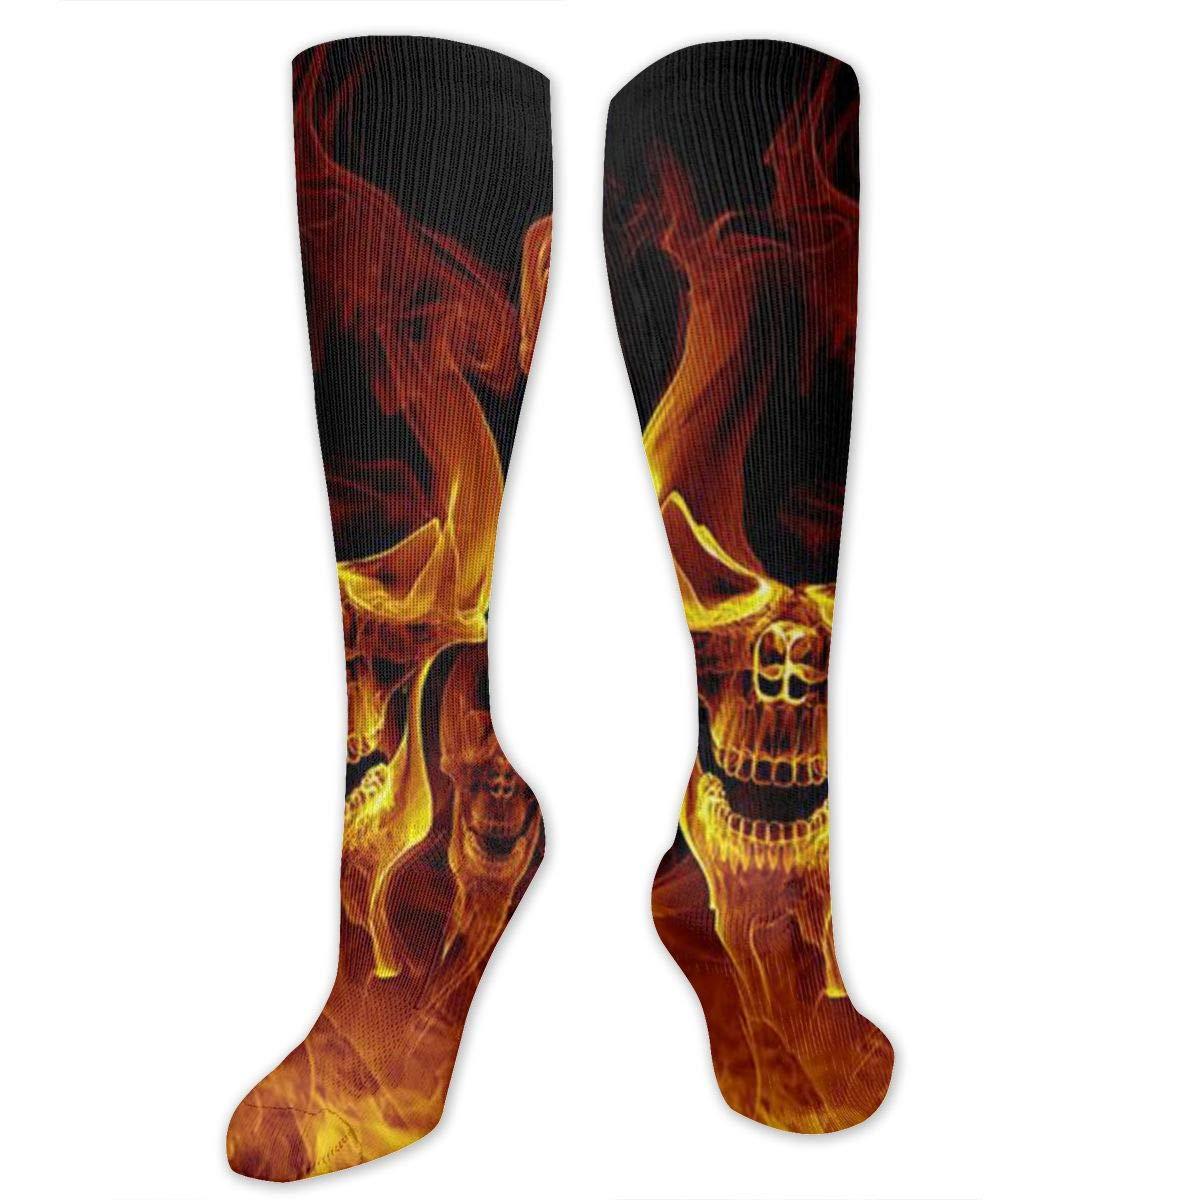 Men Multicolored Pattern Fashionable Fun Crew Cotton Socks Chanwazibibiliu Red Burnning Flame Skeleton Skull Head Mens Colorful Dress Socks Funky